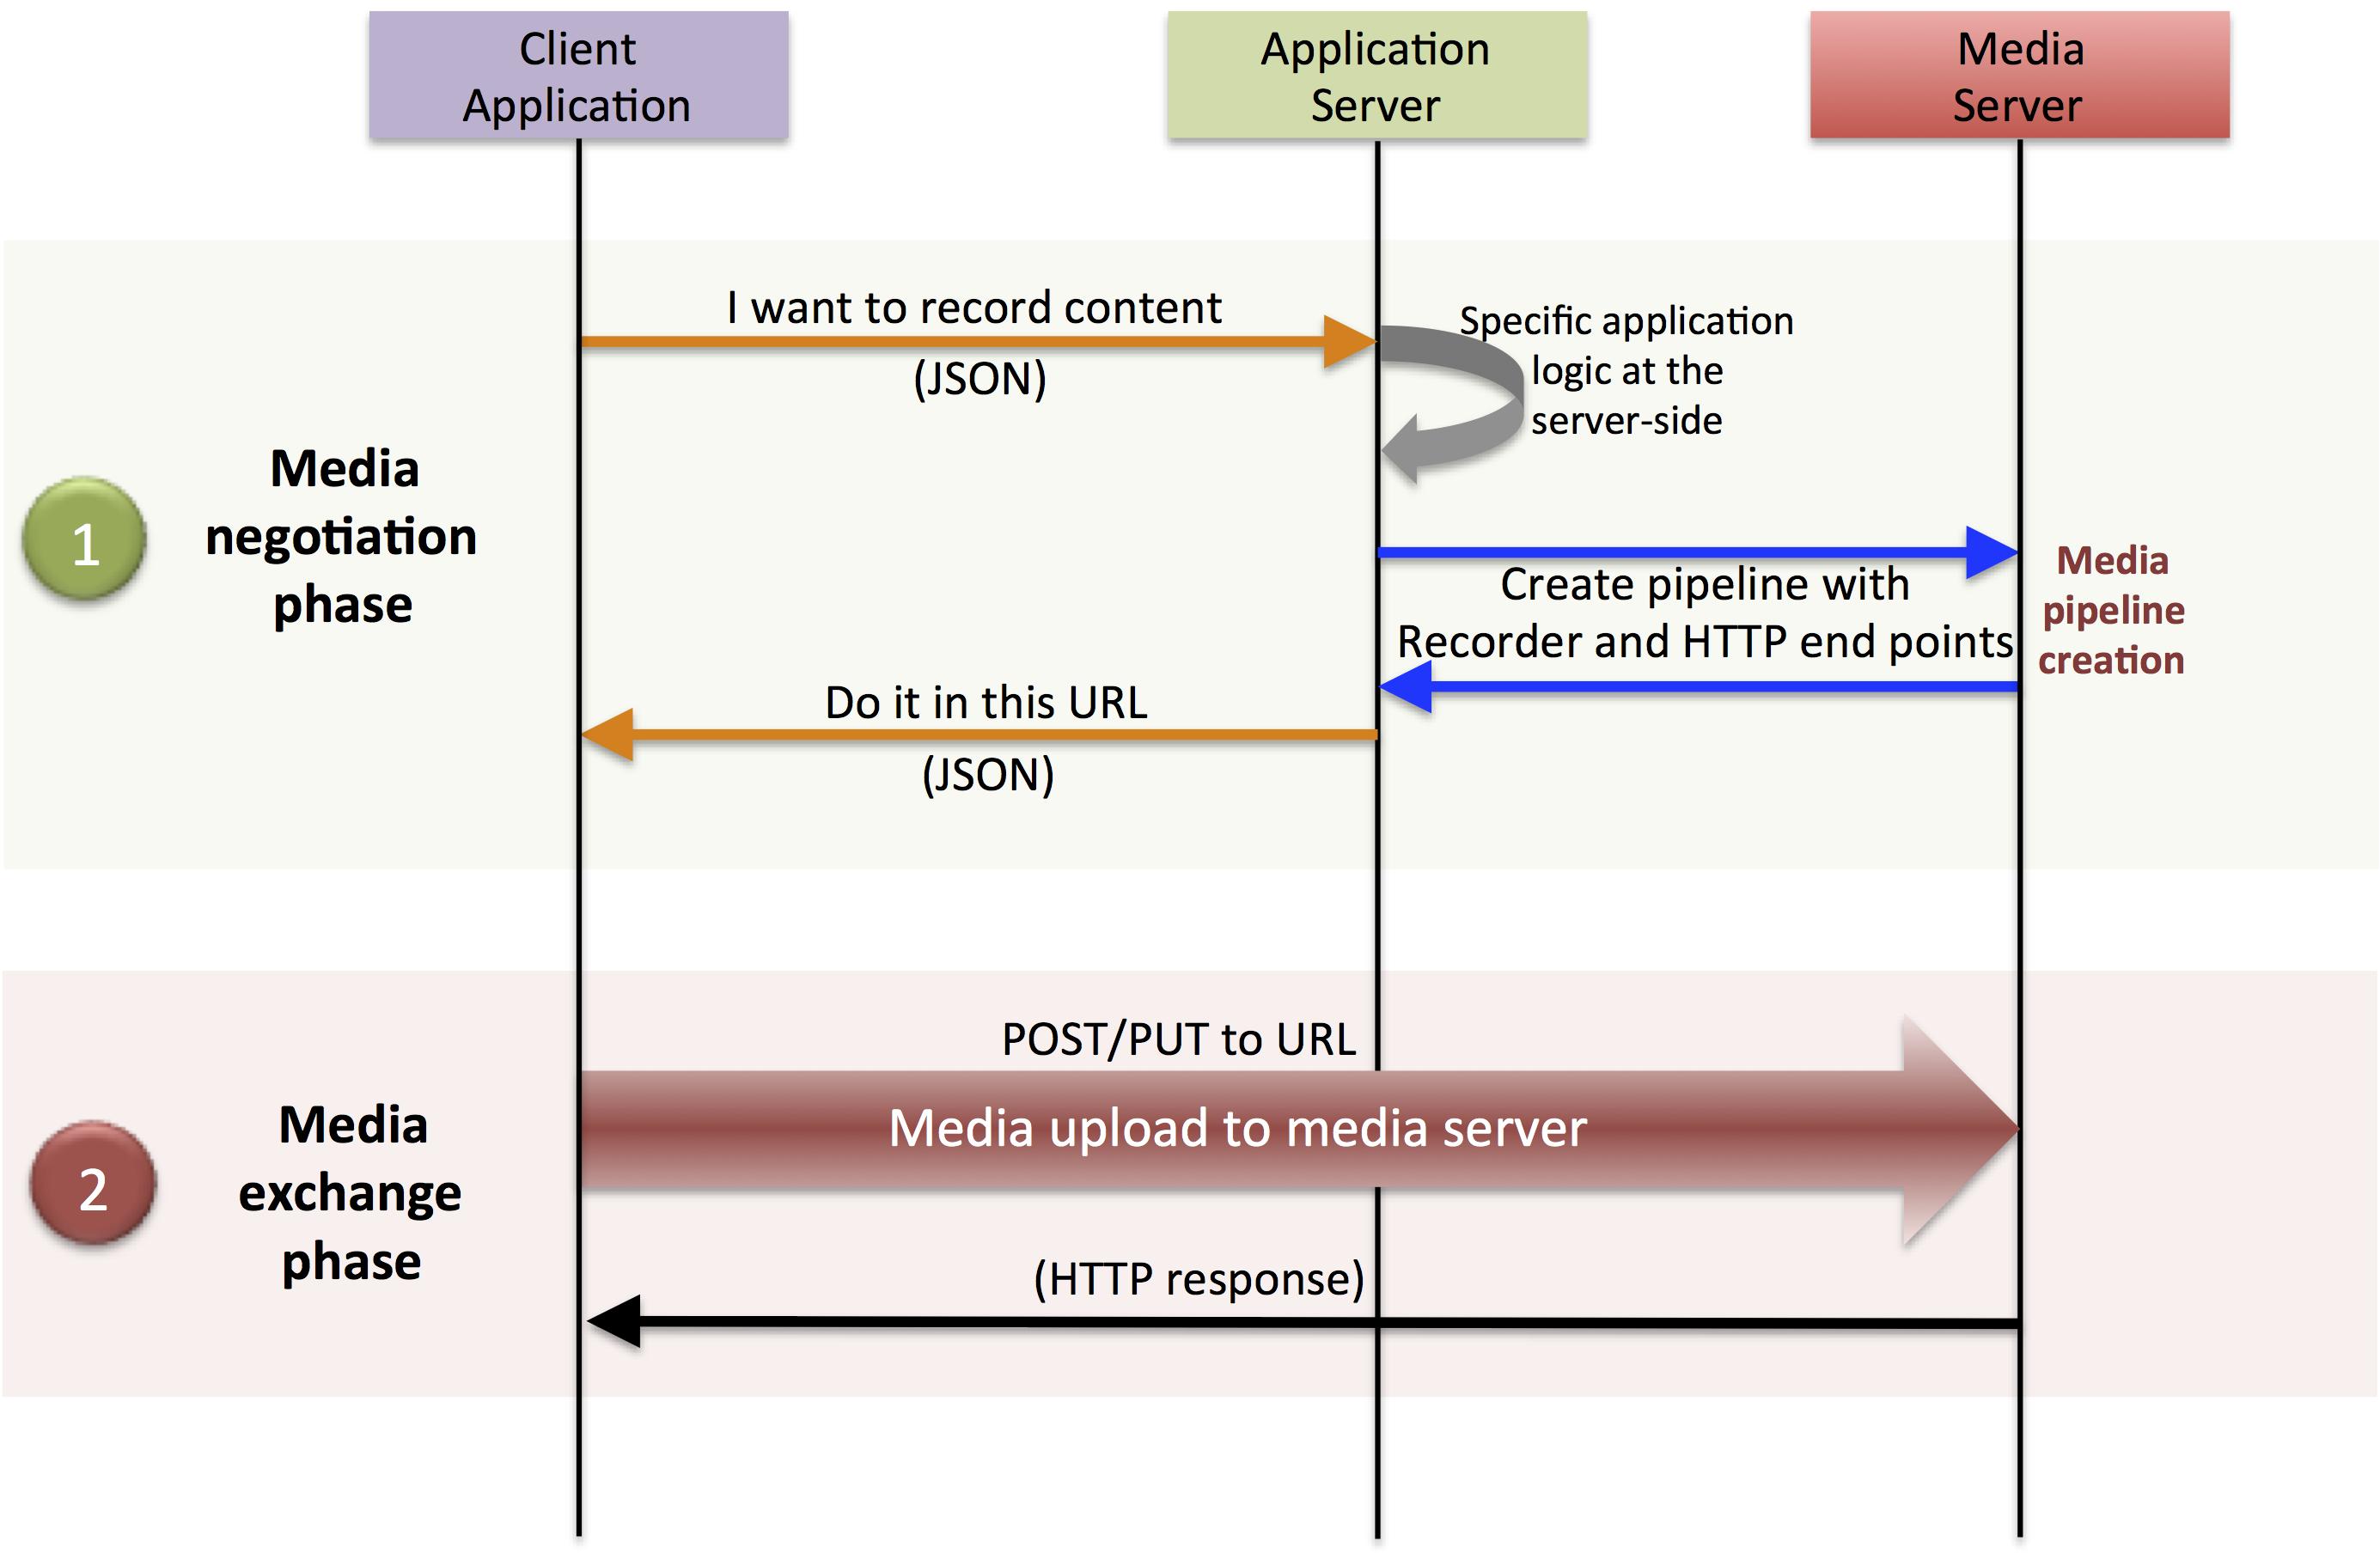 FIWARE Stream Oriented Generic Enabler - Architecture Description